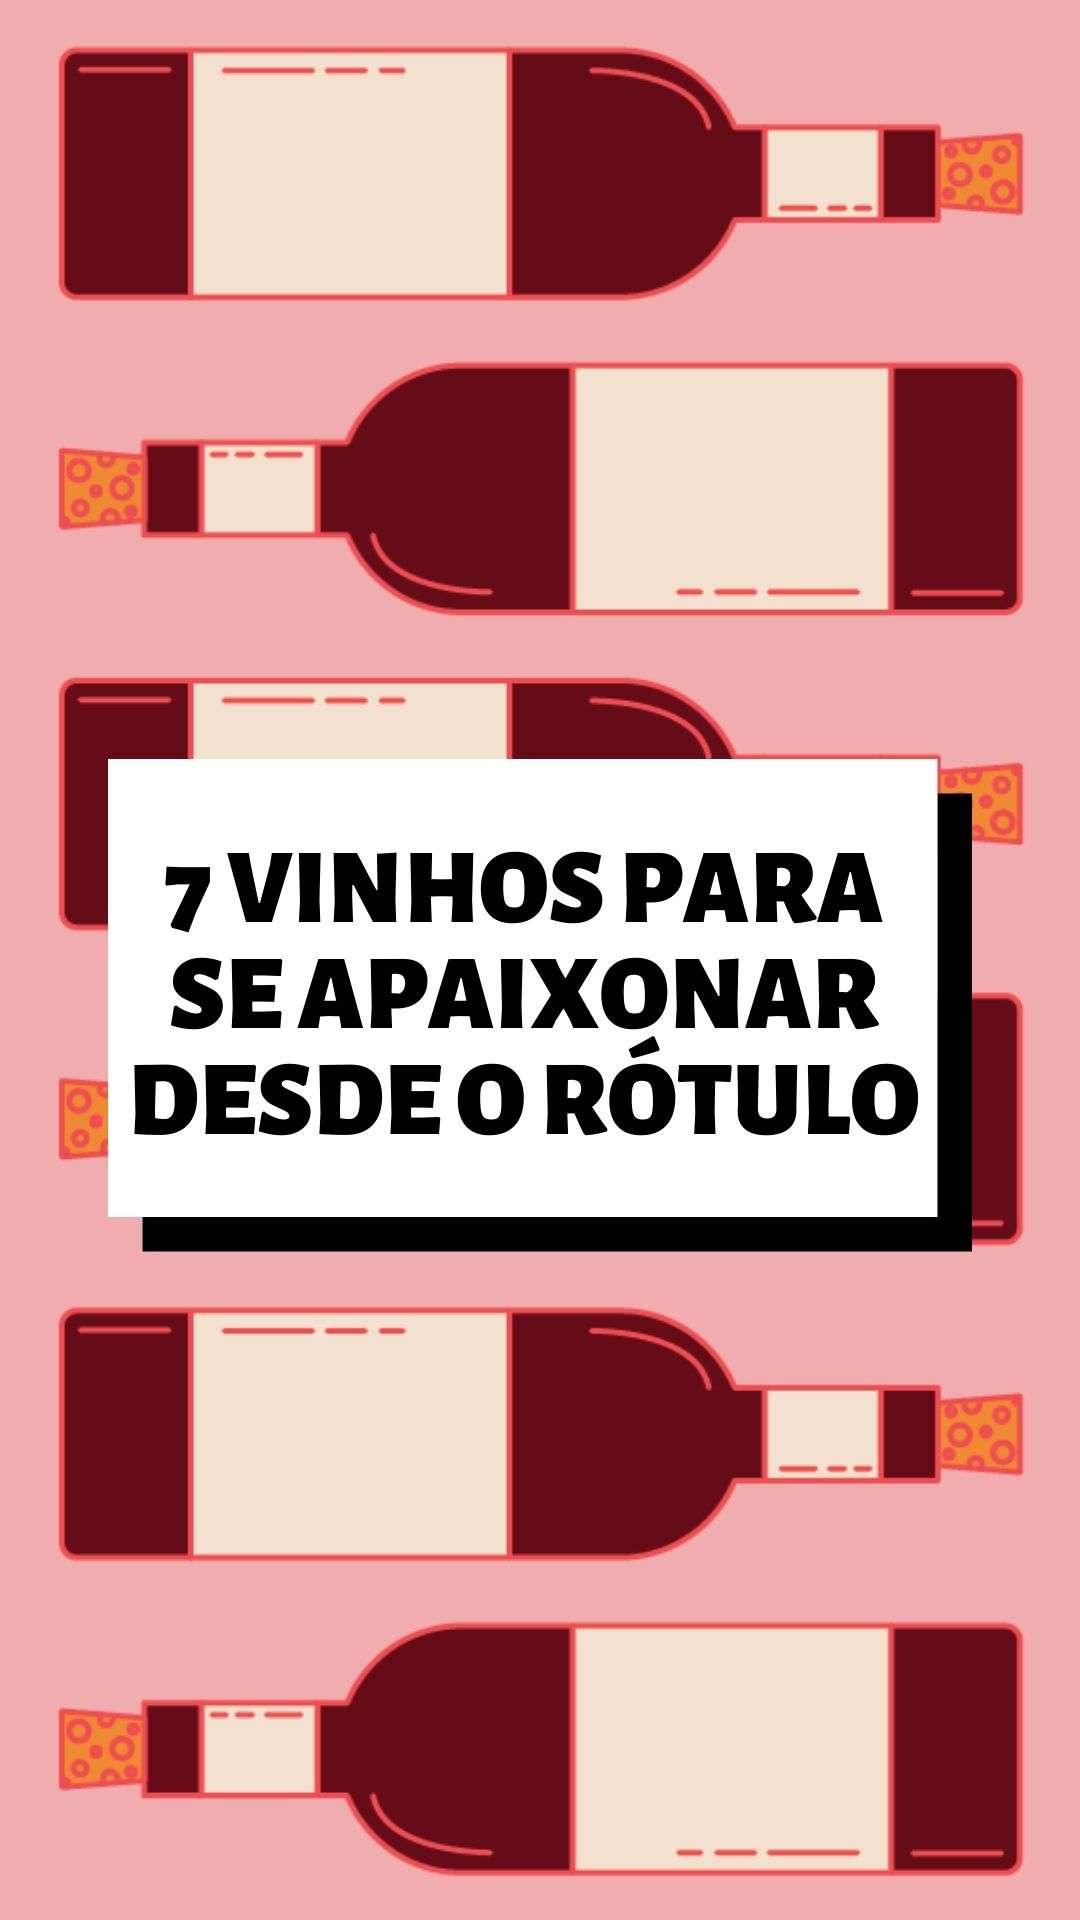 7 VINHOS PARA SE APAIXONAR DESDE O RÓTULO